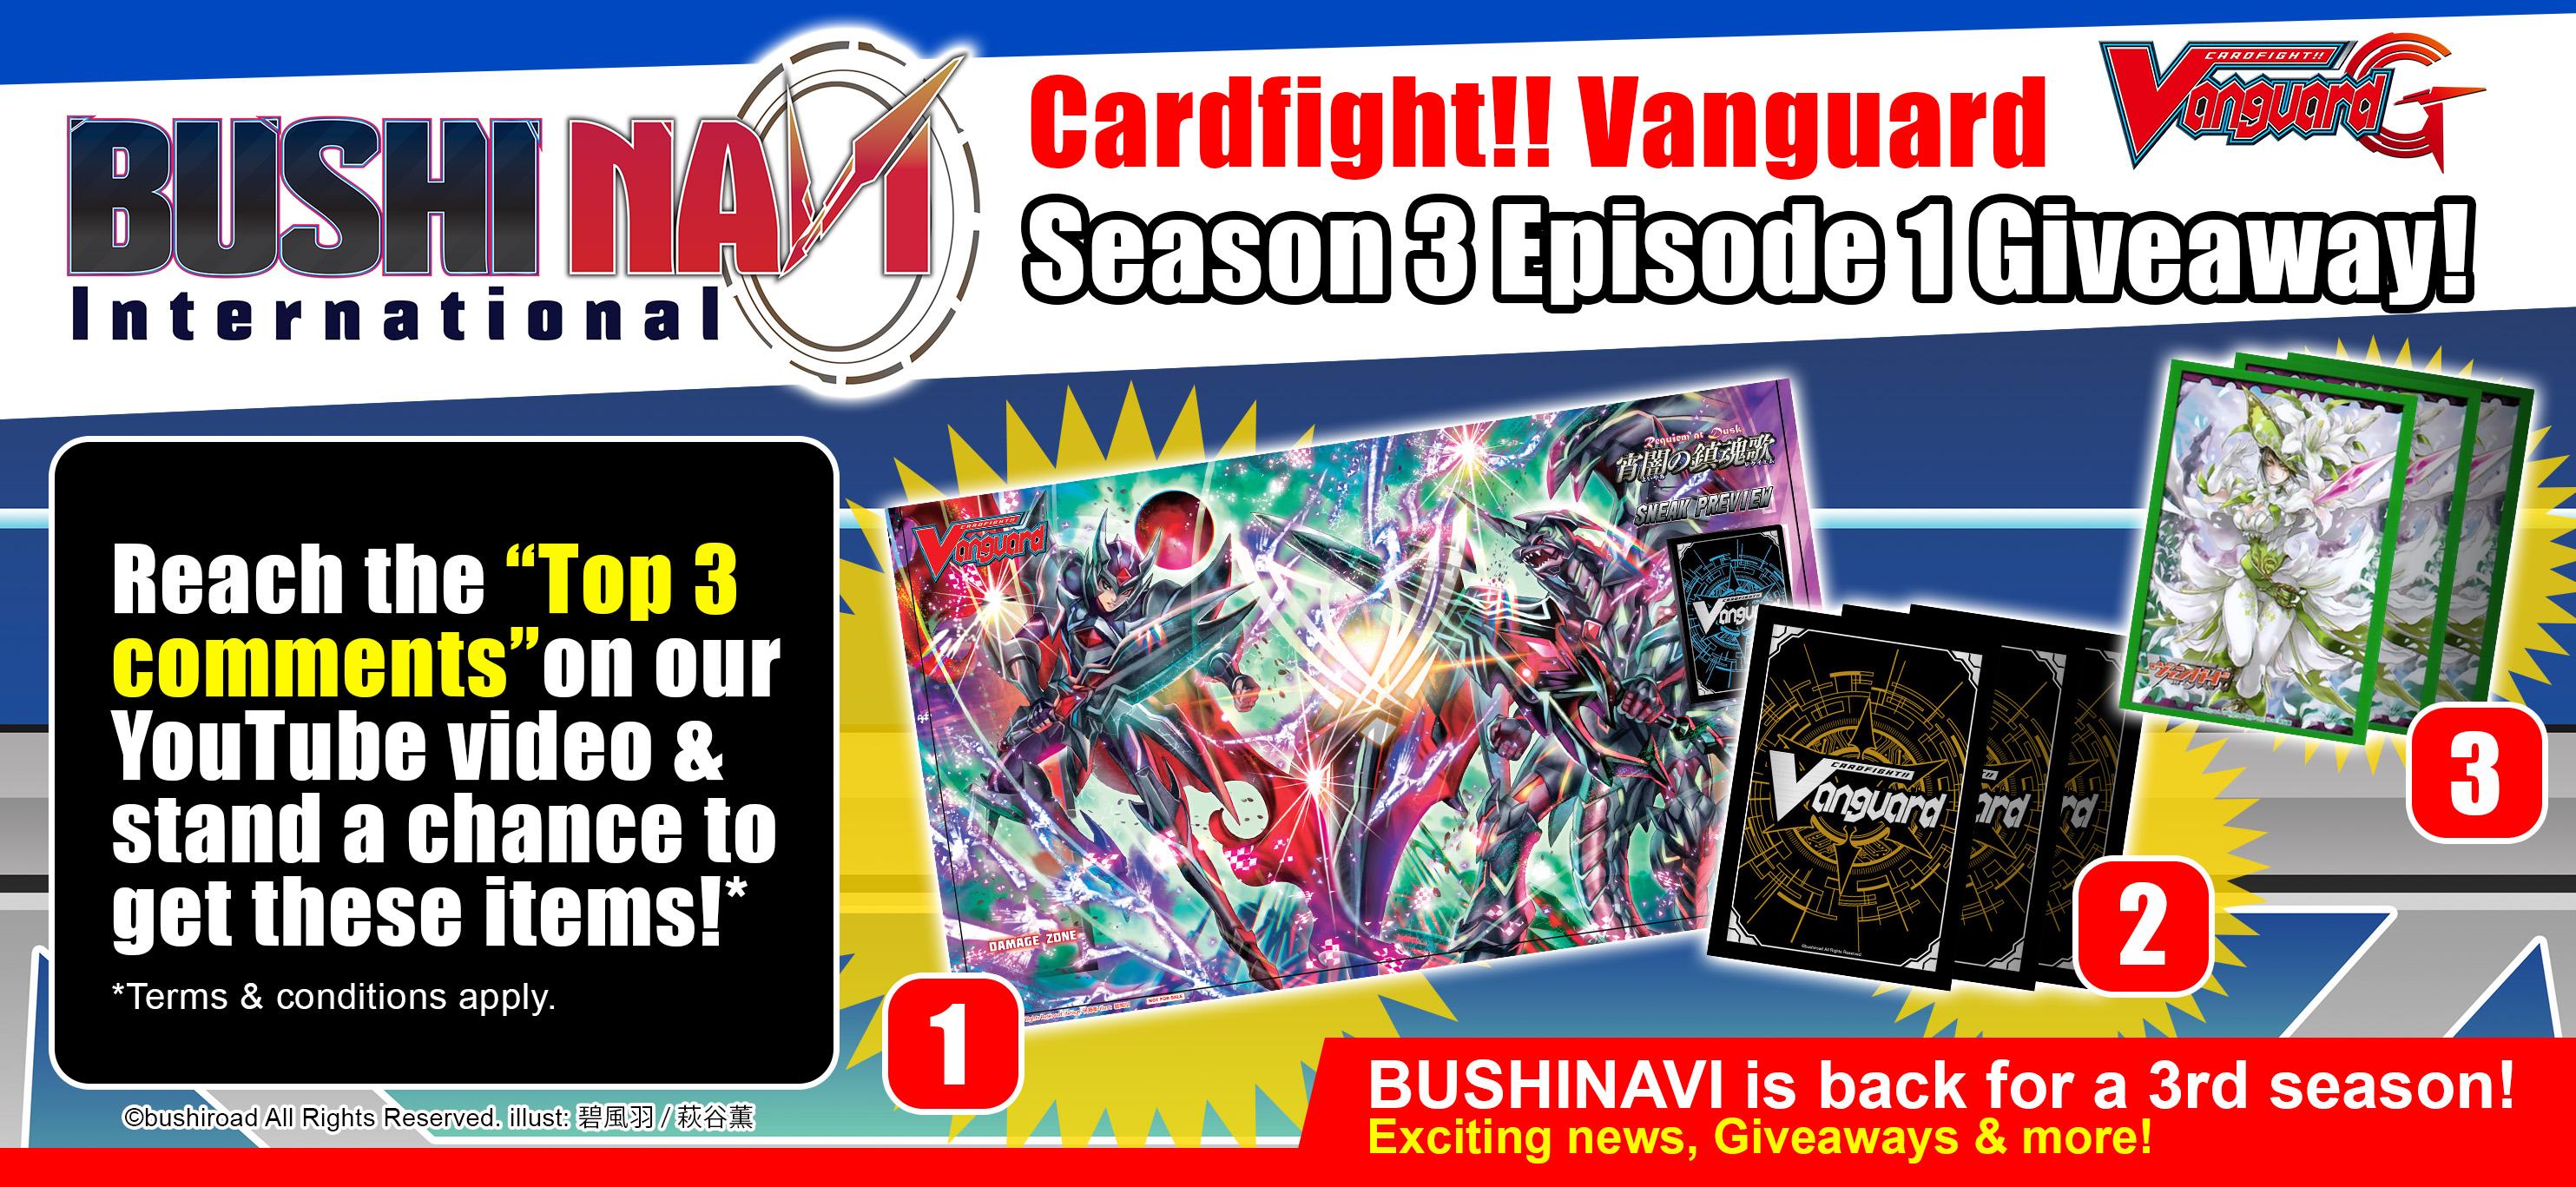 BUSHI NAVI International Season 3 Episode 1